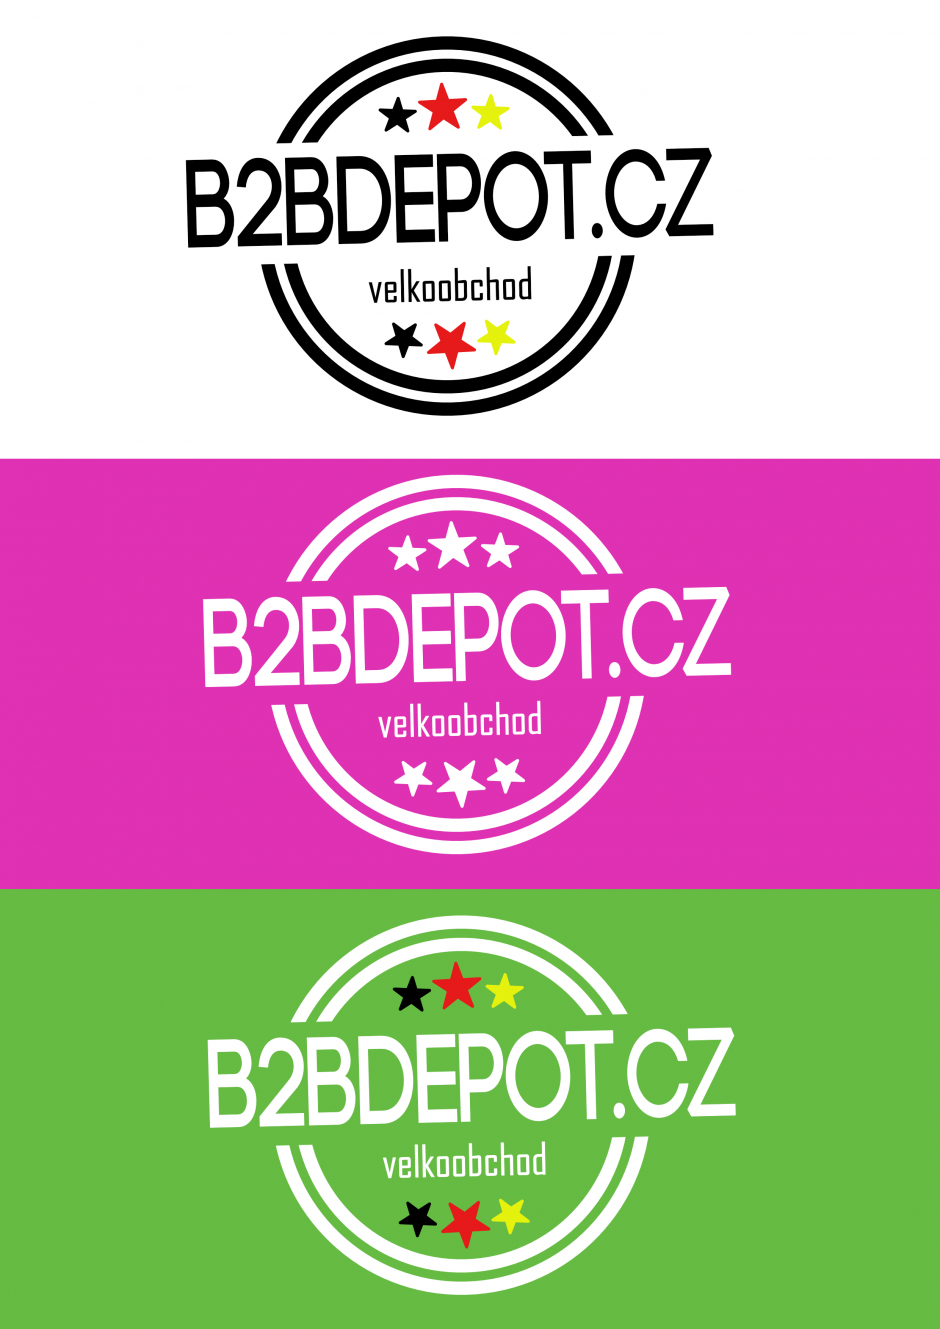 [Logo by Ssophia]